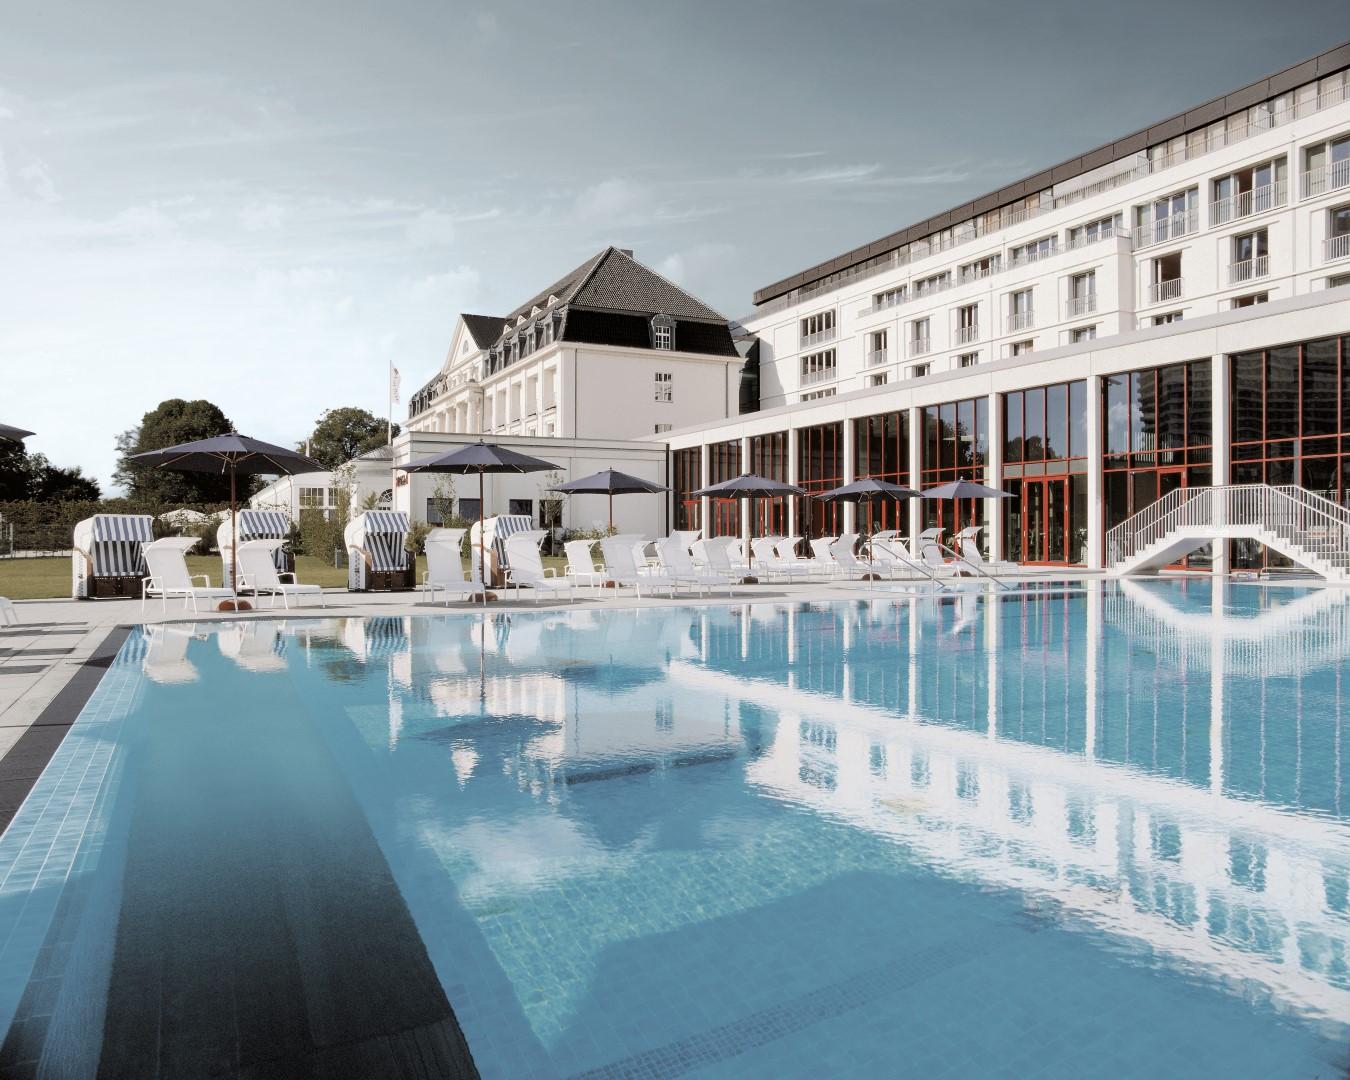 Arosa Hotel Travemünde